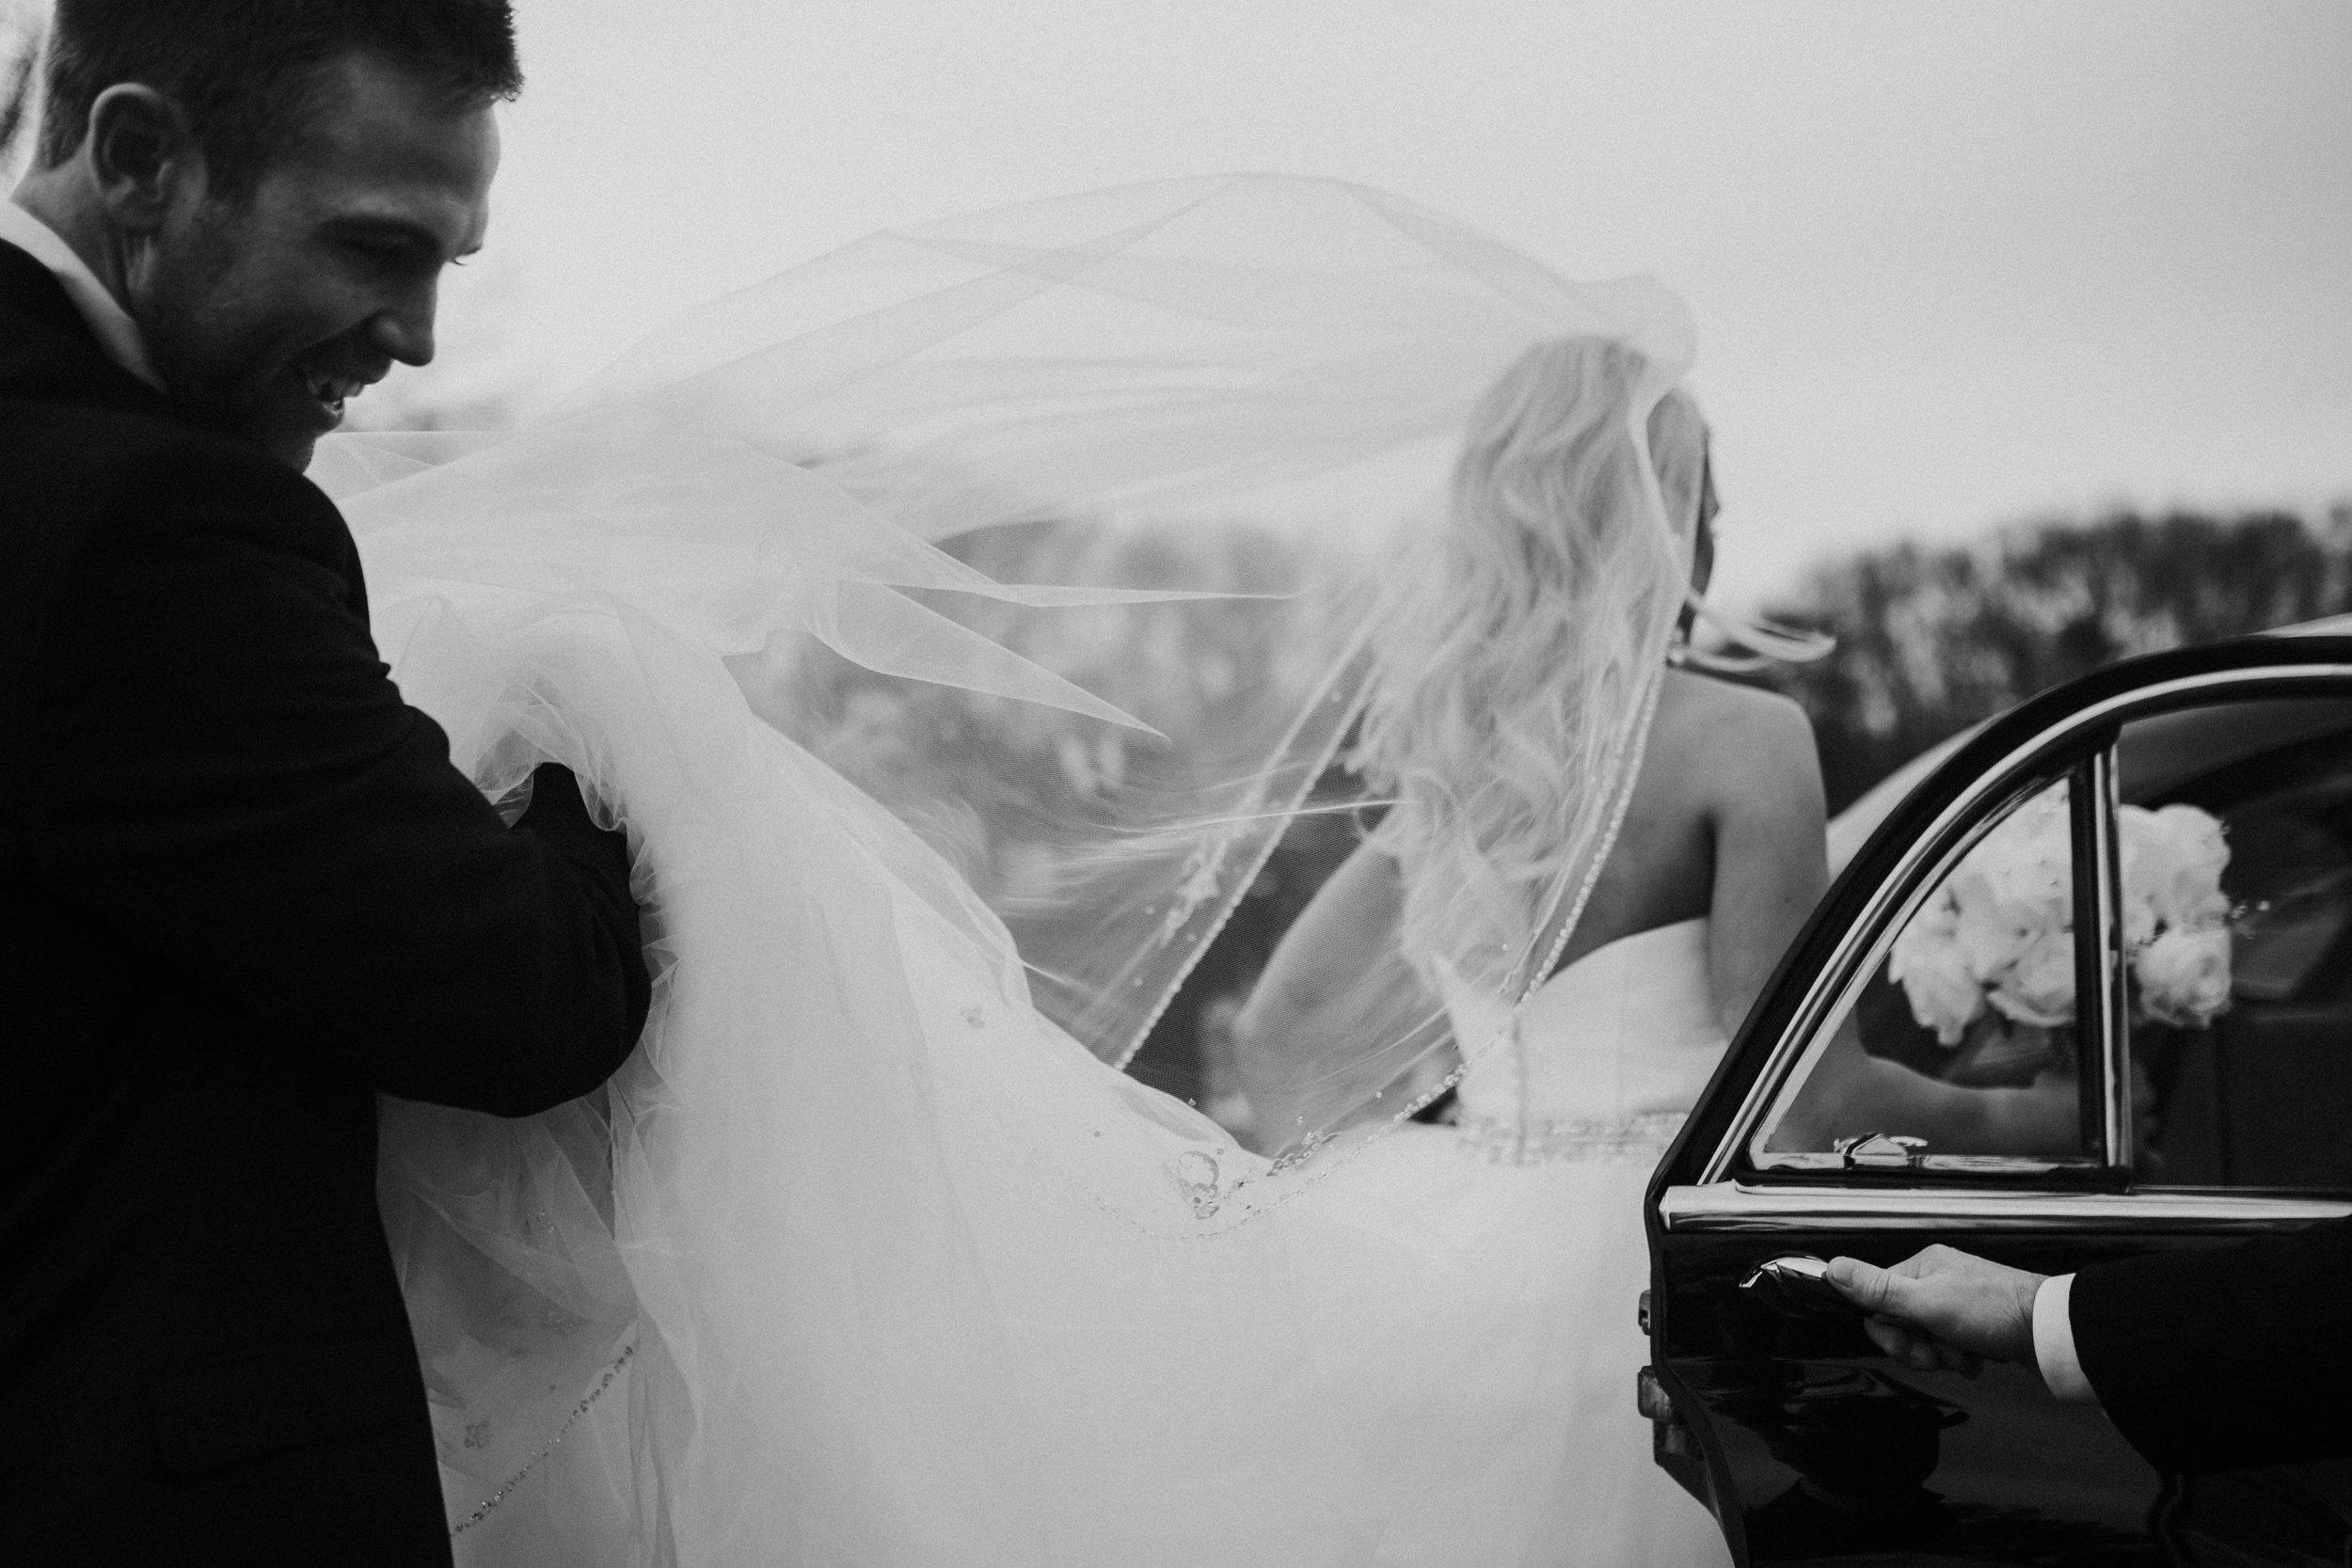 21 New Years Eve Wedding Classic Car Weddding Aribella Events.jpg